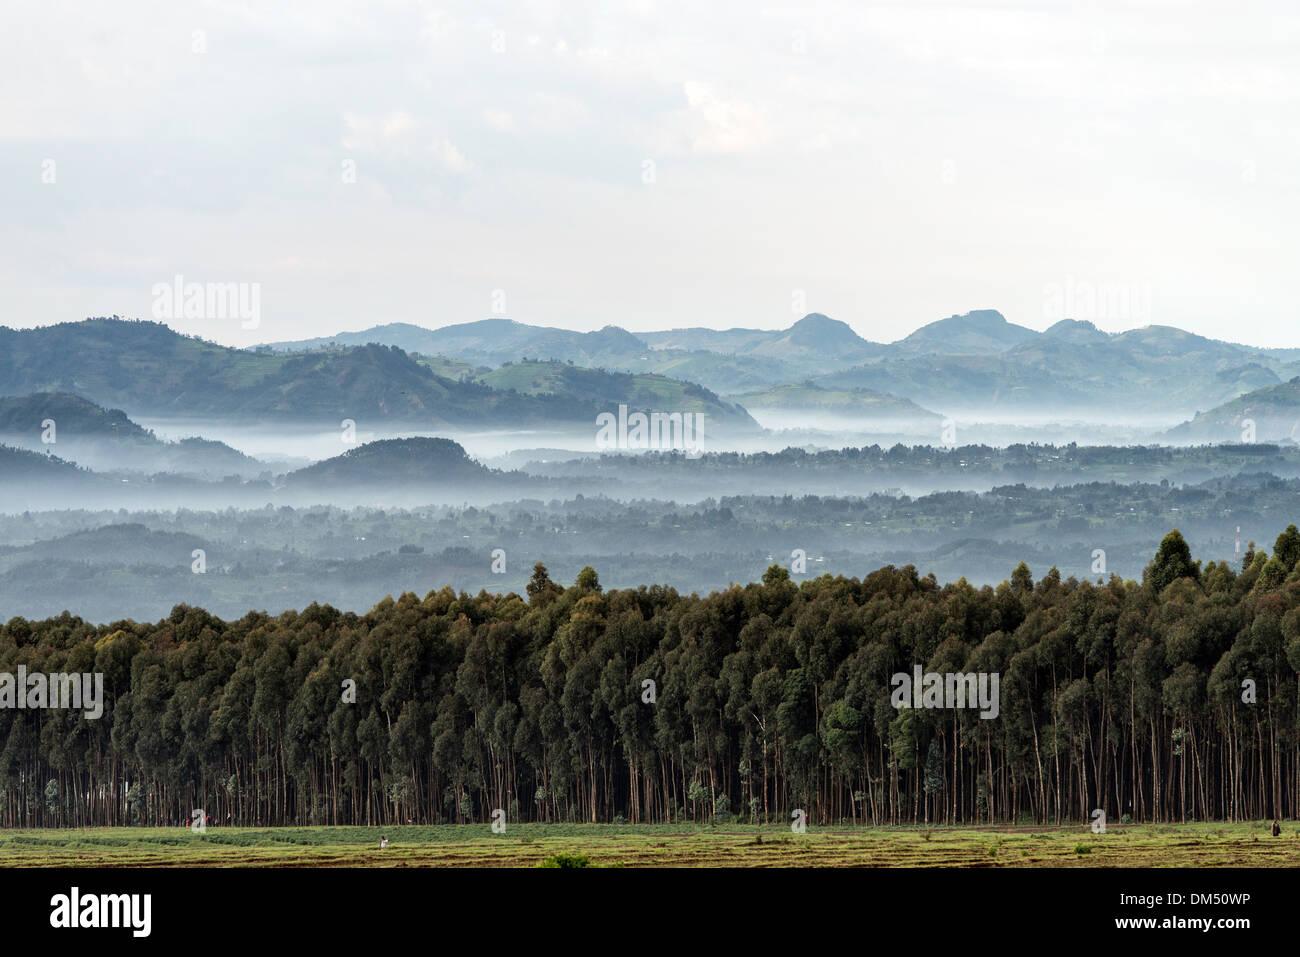 Landscapes Volcanoes National Park Rwanda Africa - Stock Image